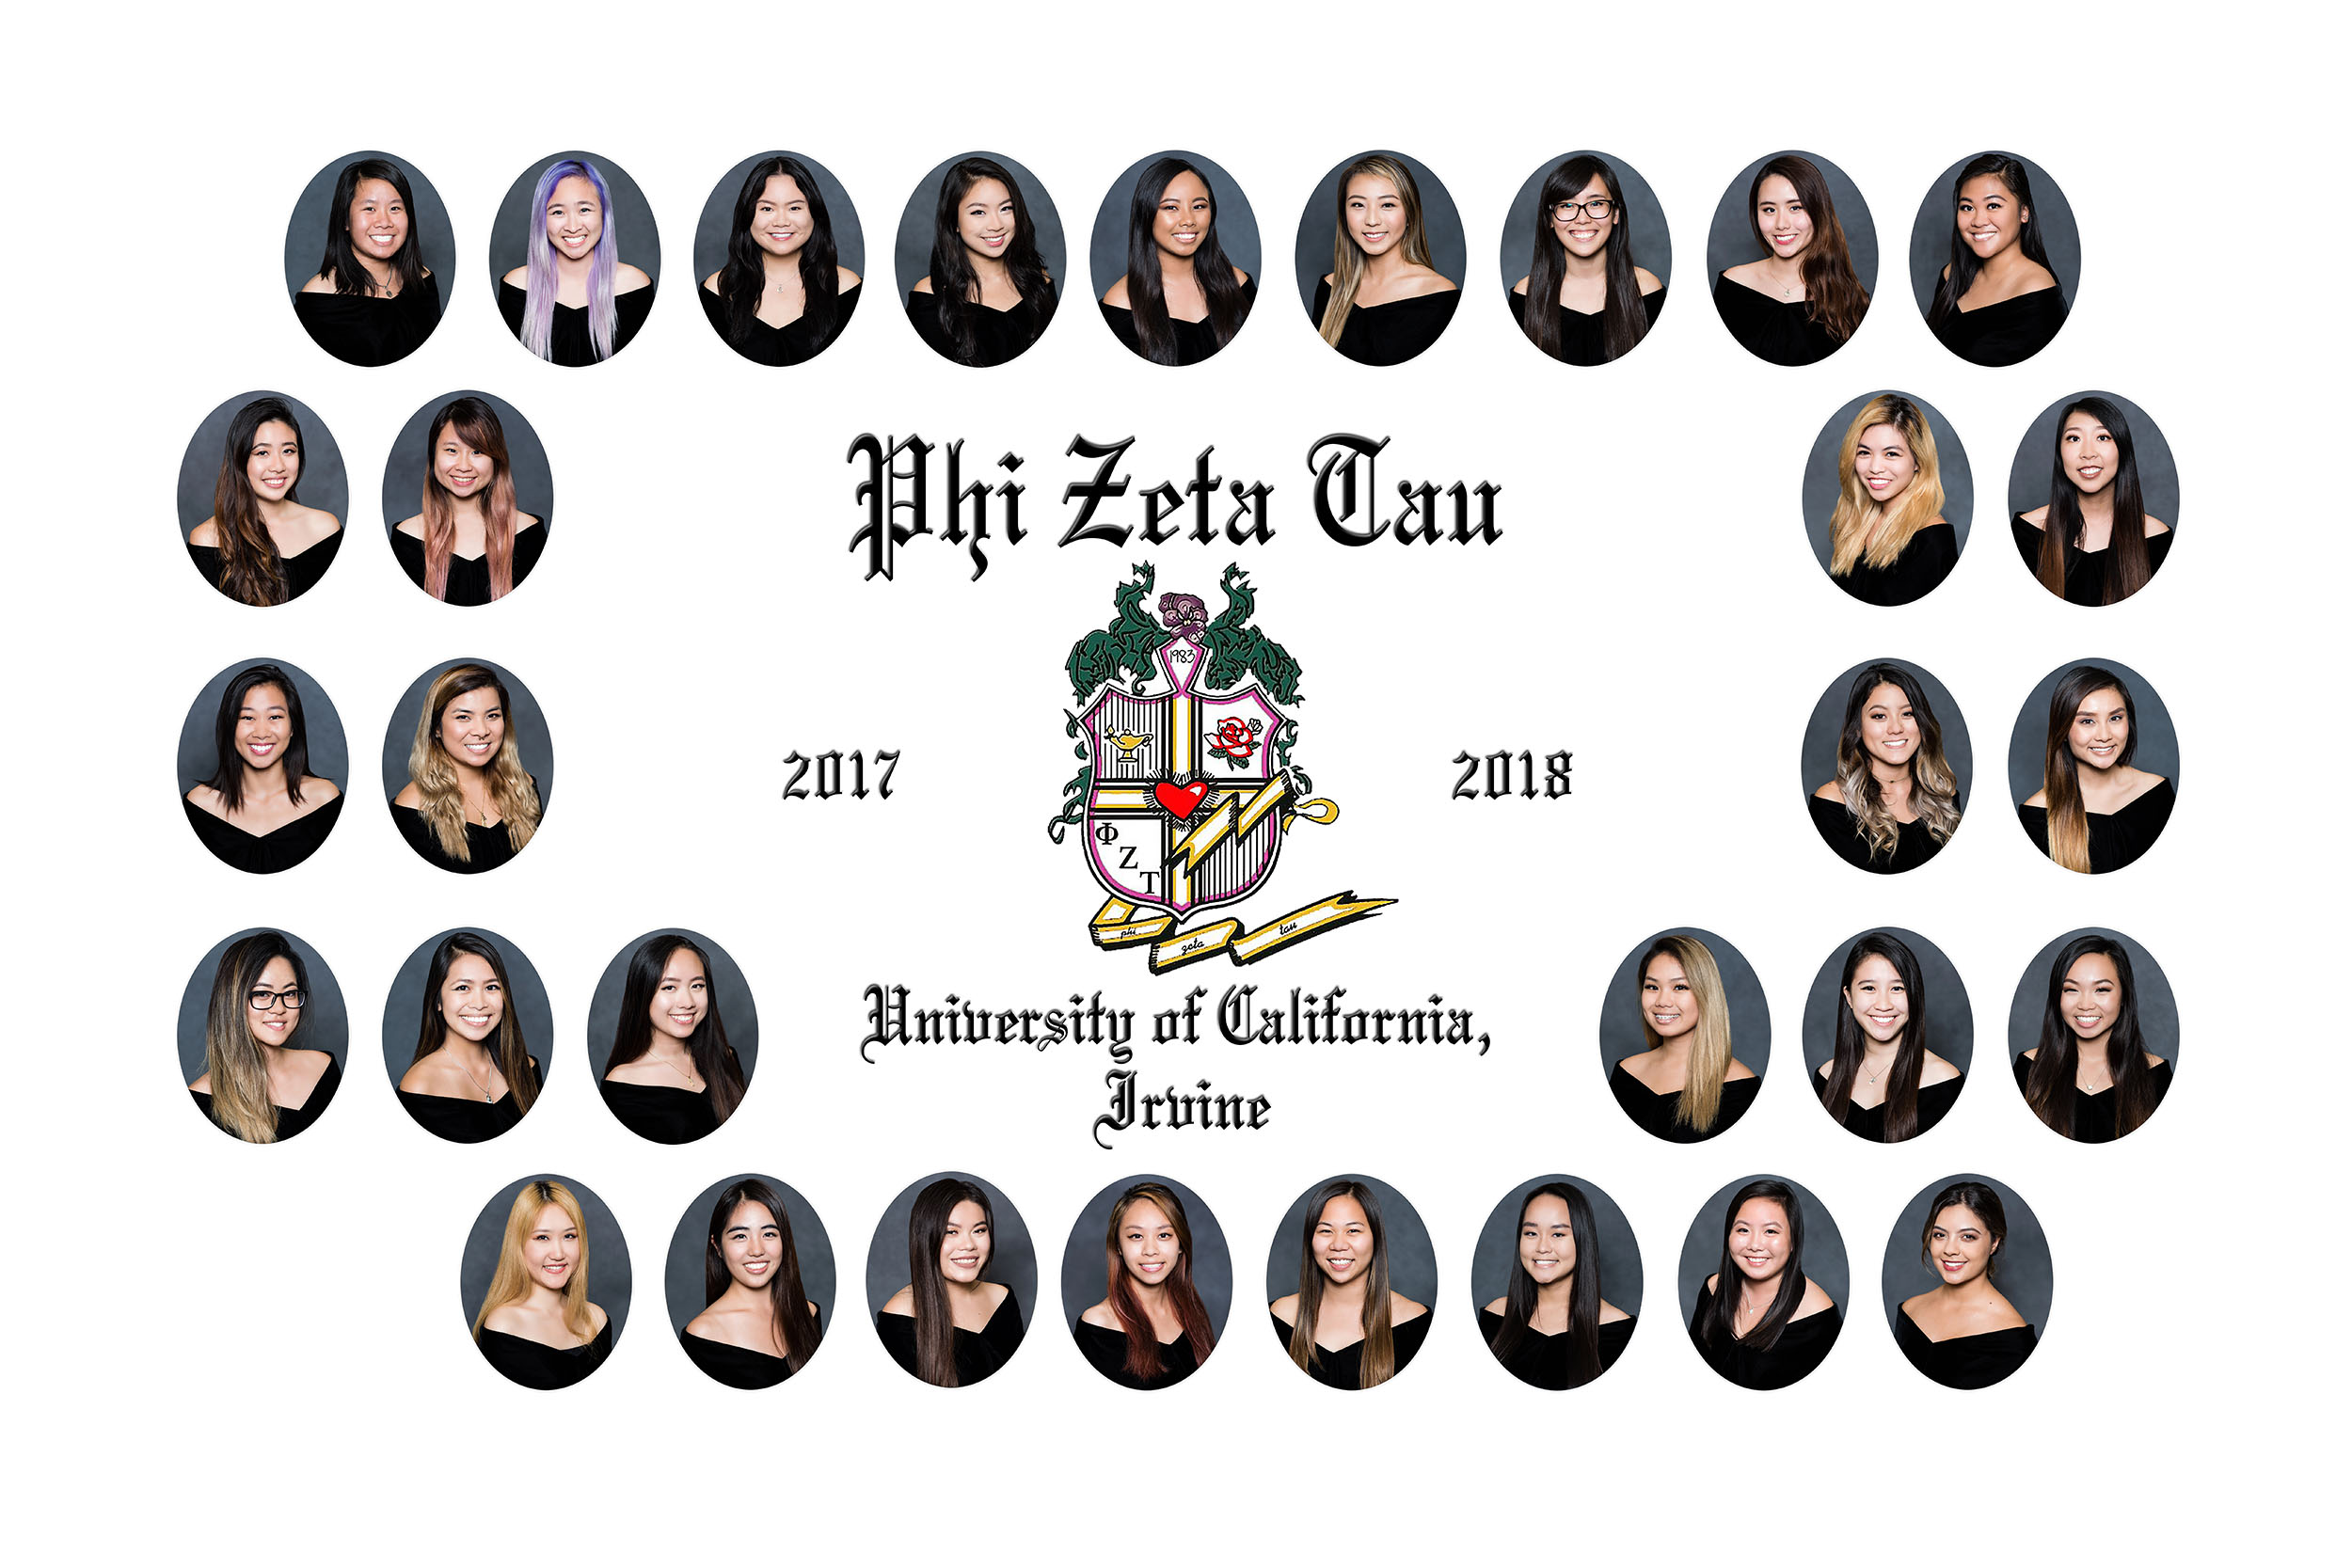 Bryan-Miraflor-Photography-Phi-Zeta-Tau-UC-Irvine-Sorority-Composite-2017-2018.jpg